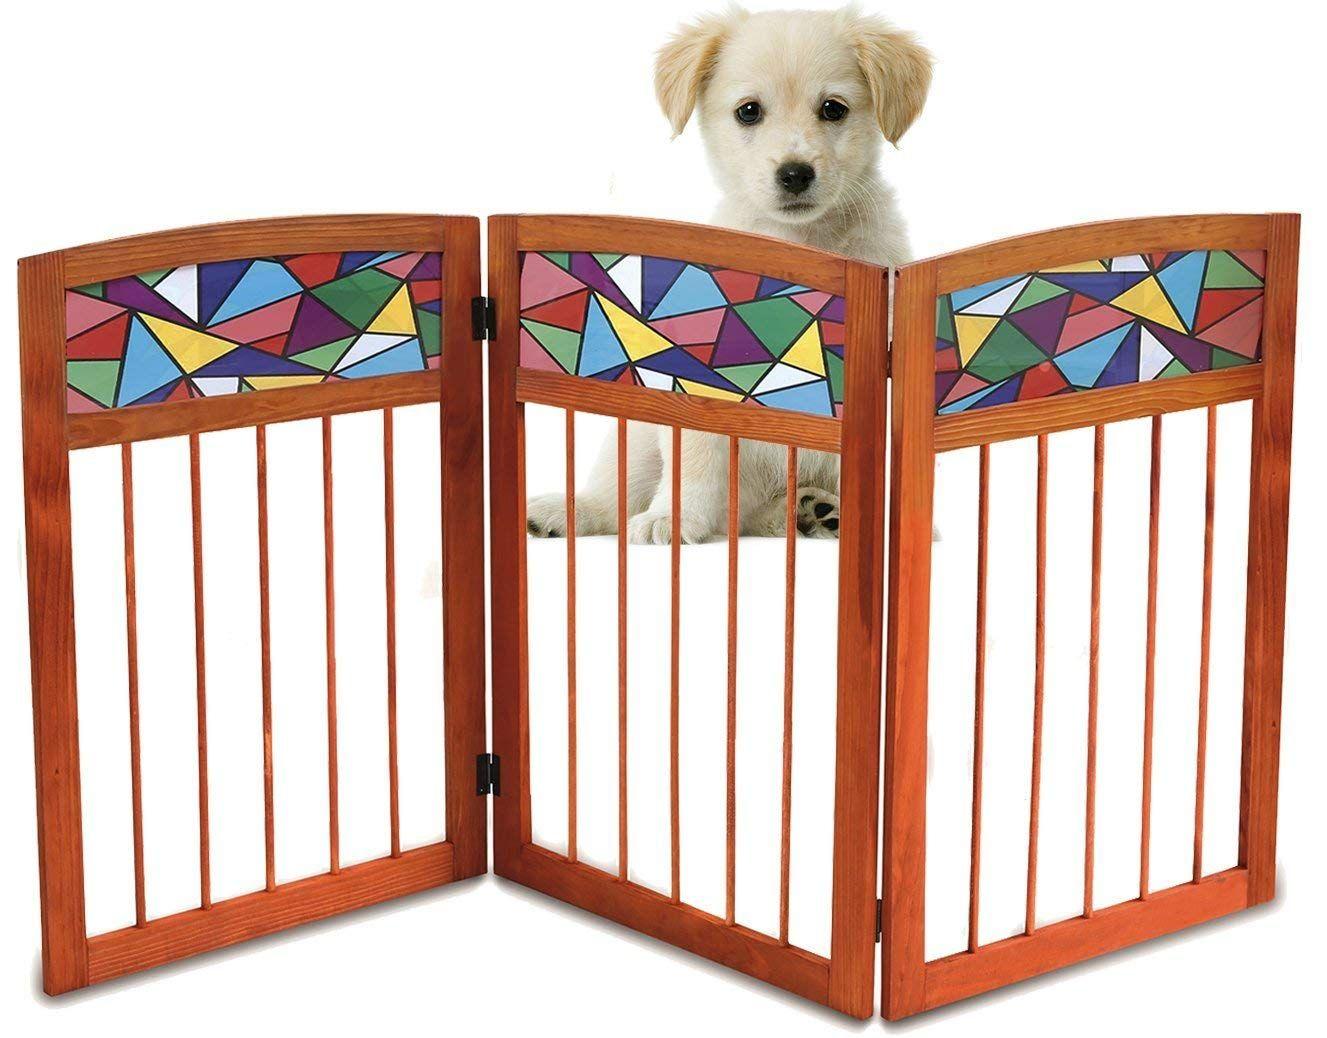 Kleeger Freestanding Wooden Pet Gate Safety Gate For Indoor Home